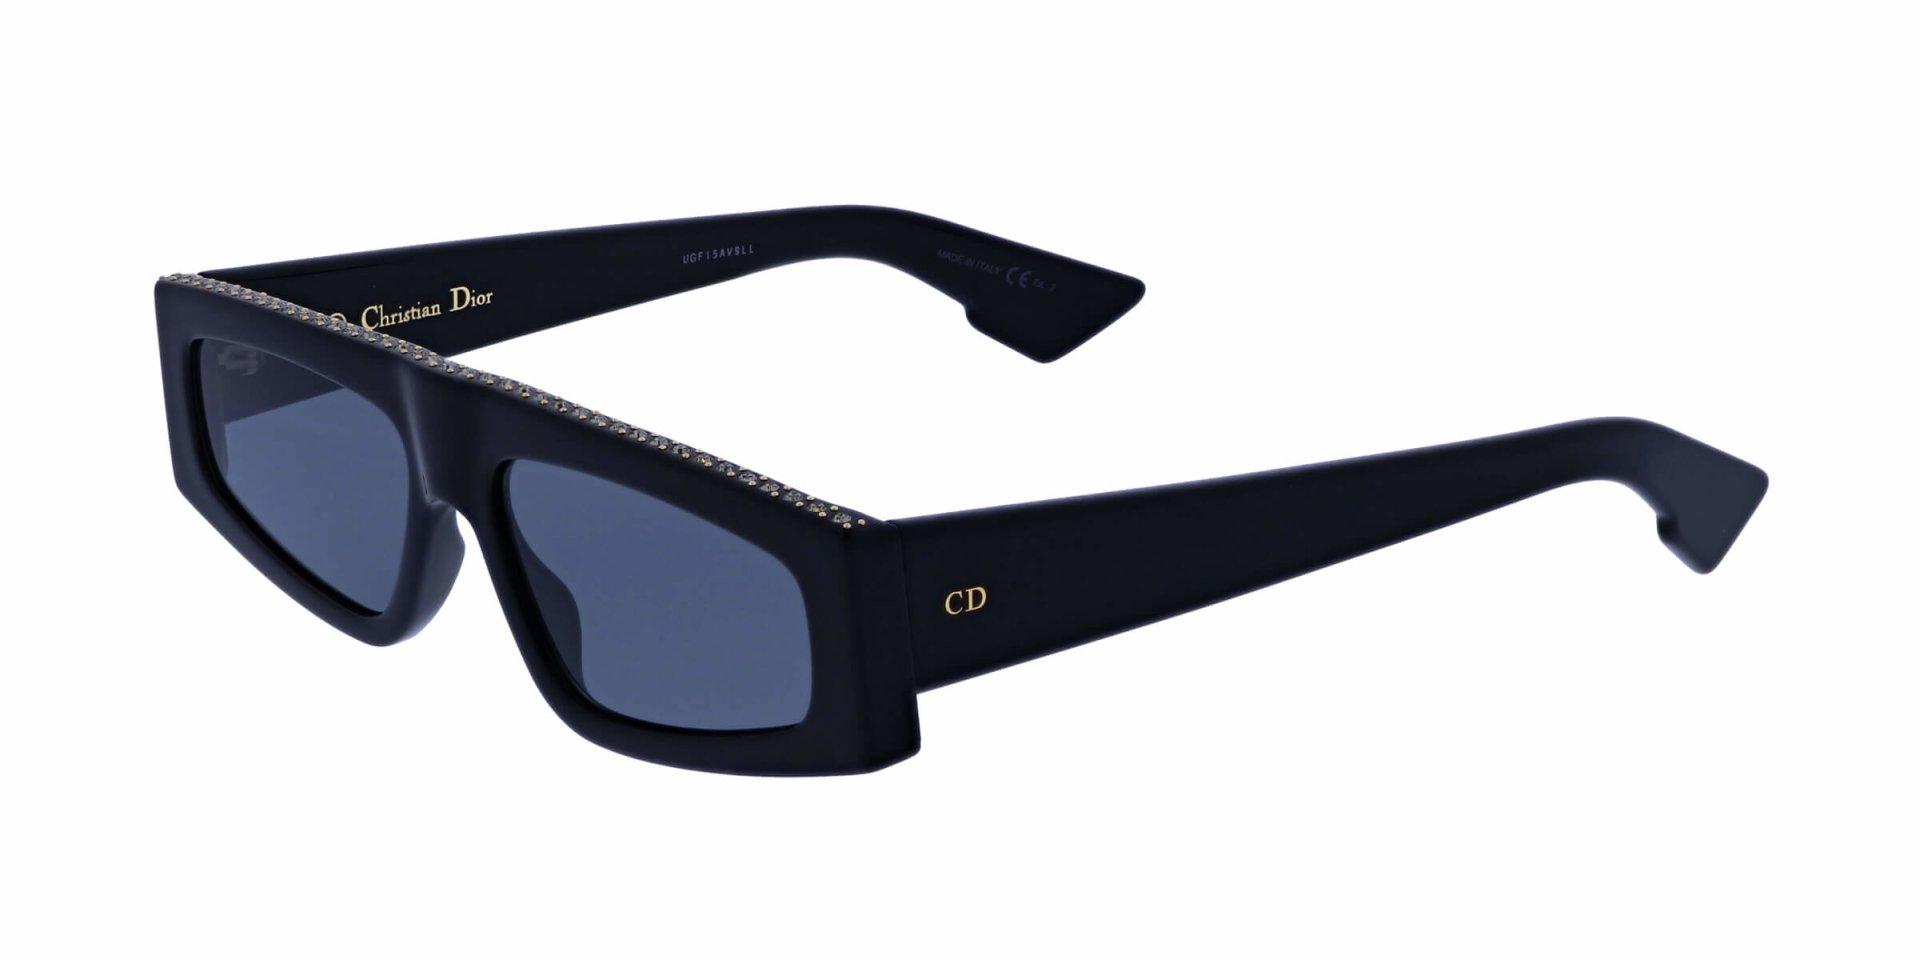 7dbe023935c7 Sunglasses DIOR